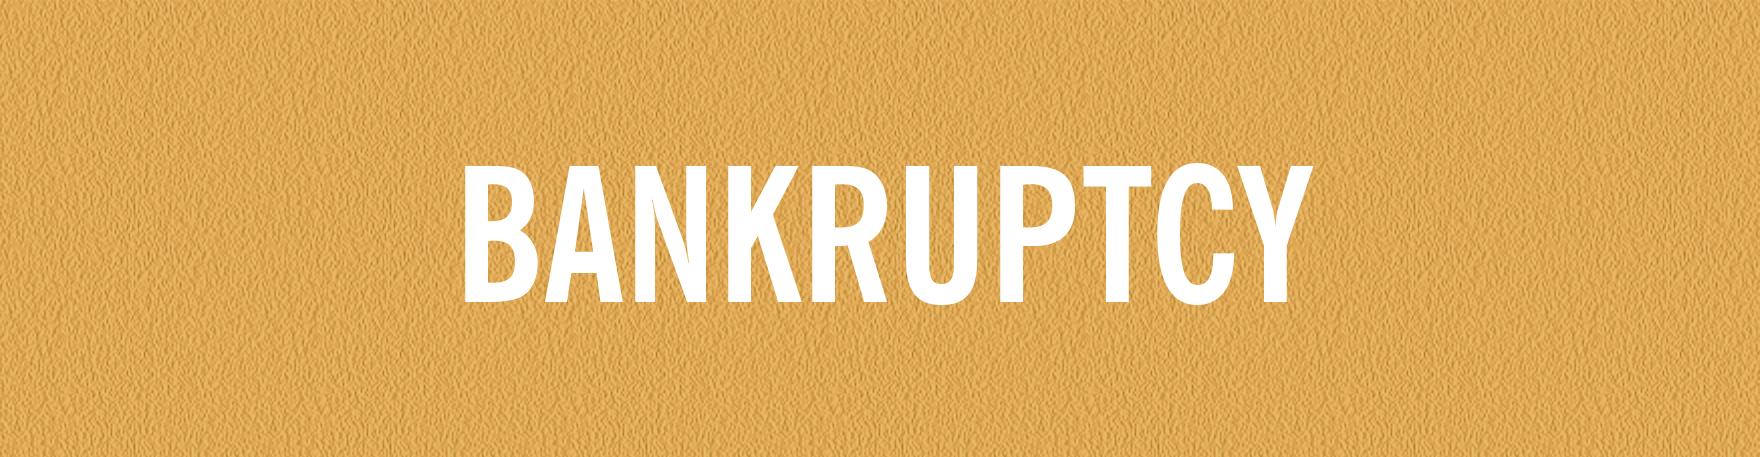 Peton-Law-LARGE-BUTTONS-BANKRUPTCY